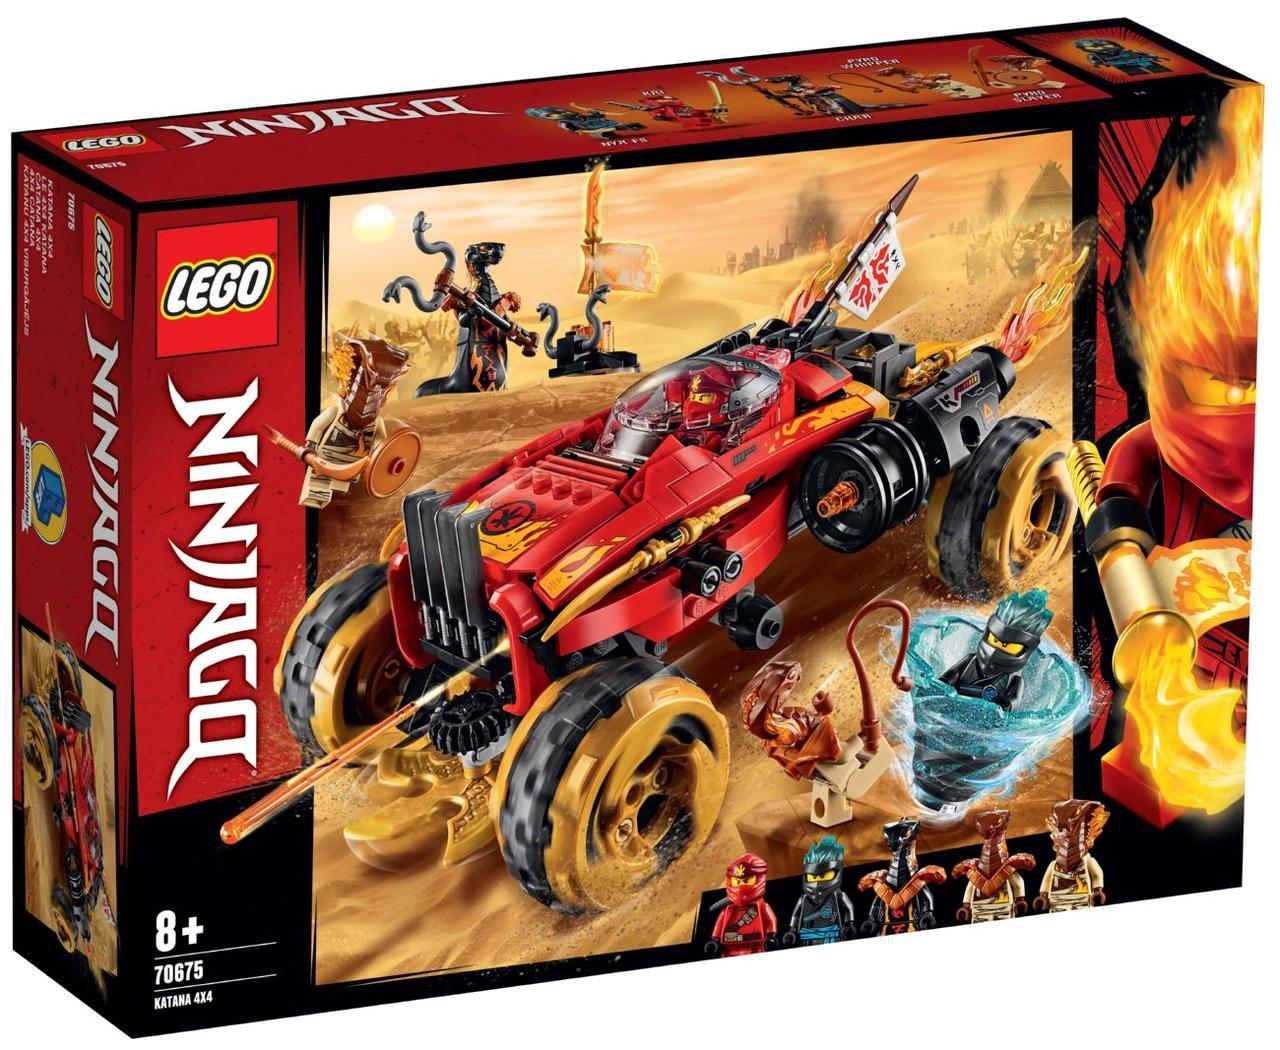 Lego Ninjago Внедорожник Катана 4x4 70675